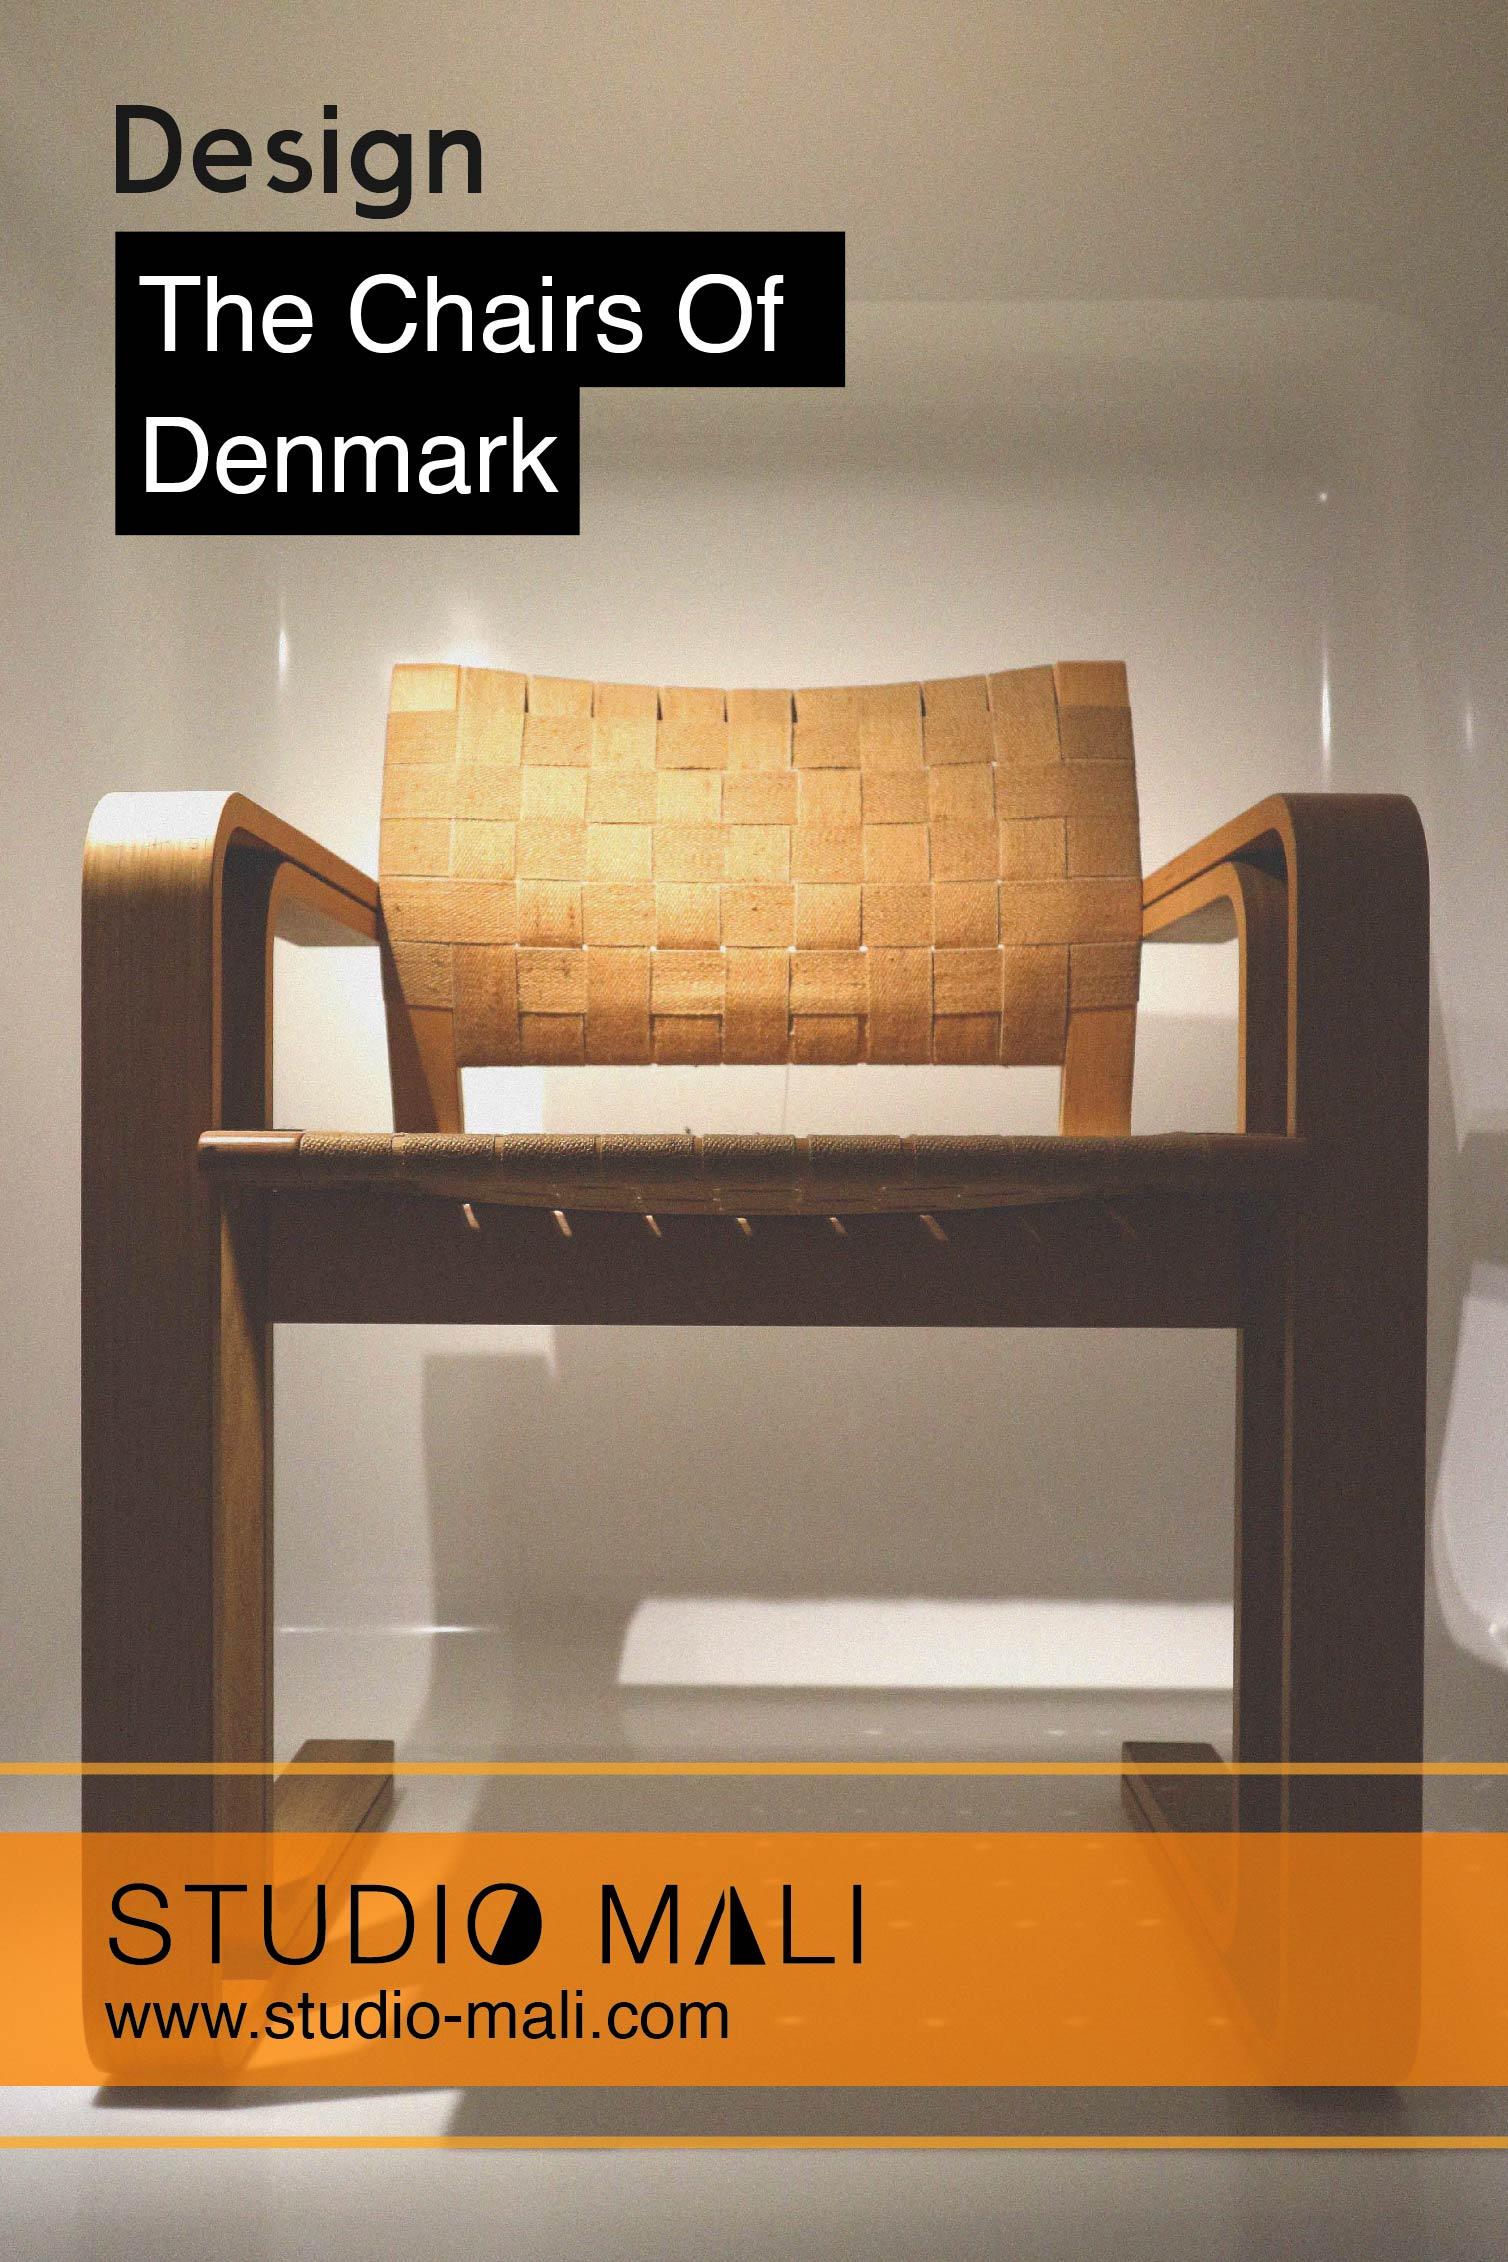 The Chairs Of Denmark, by Studio Mali.jpg